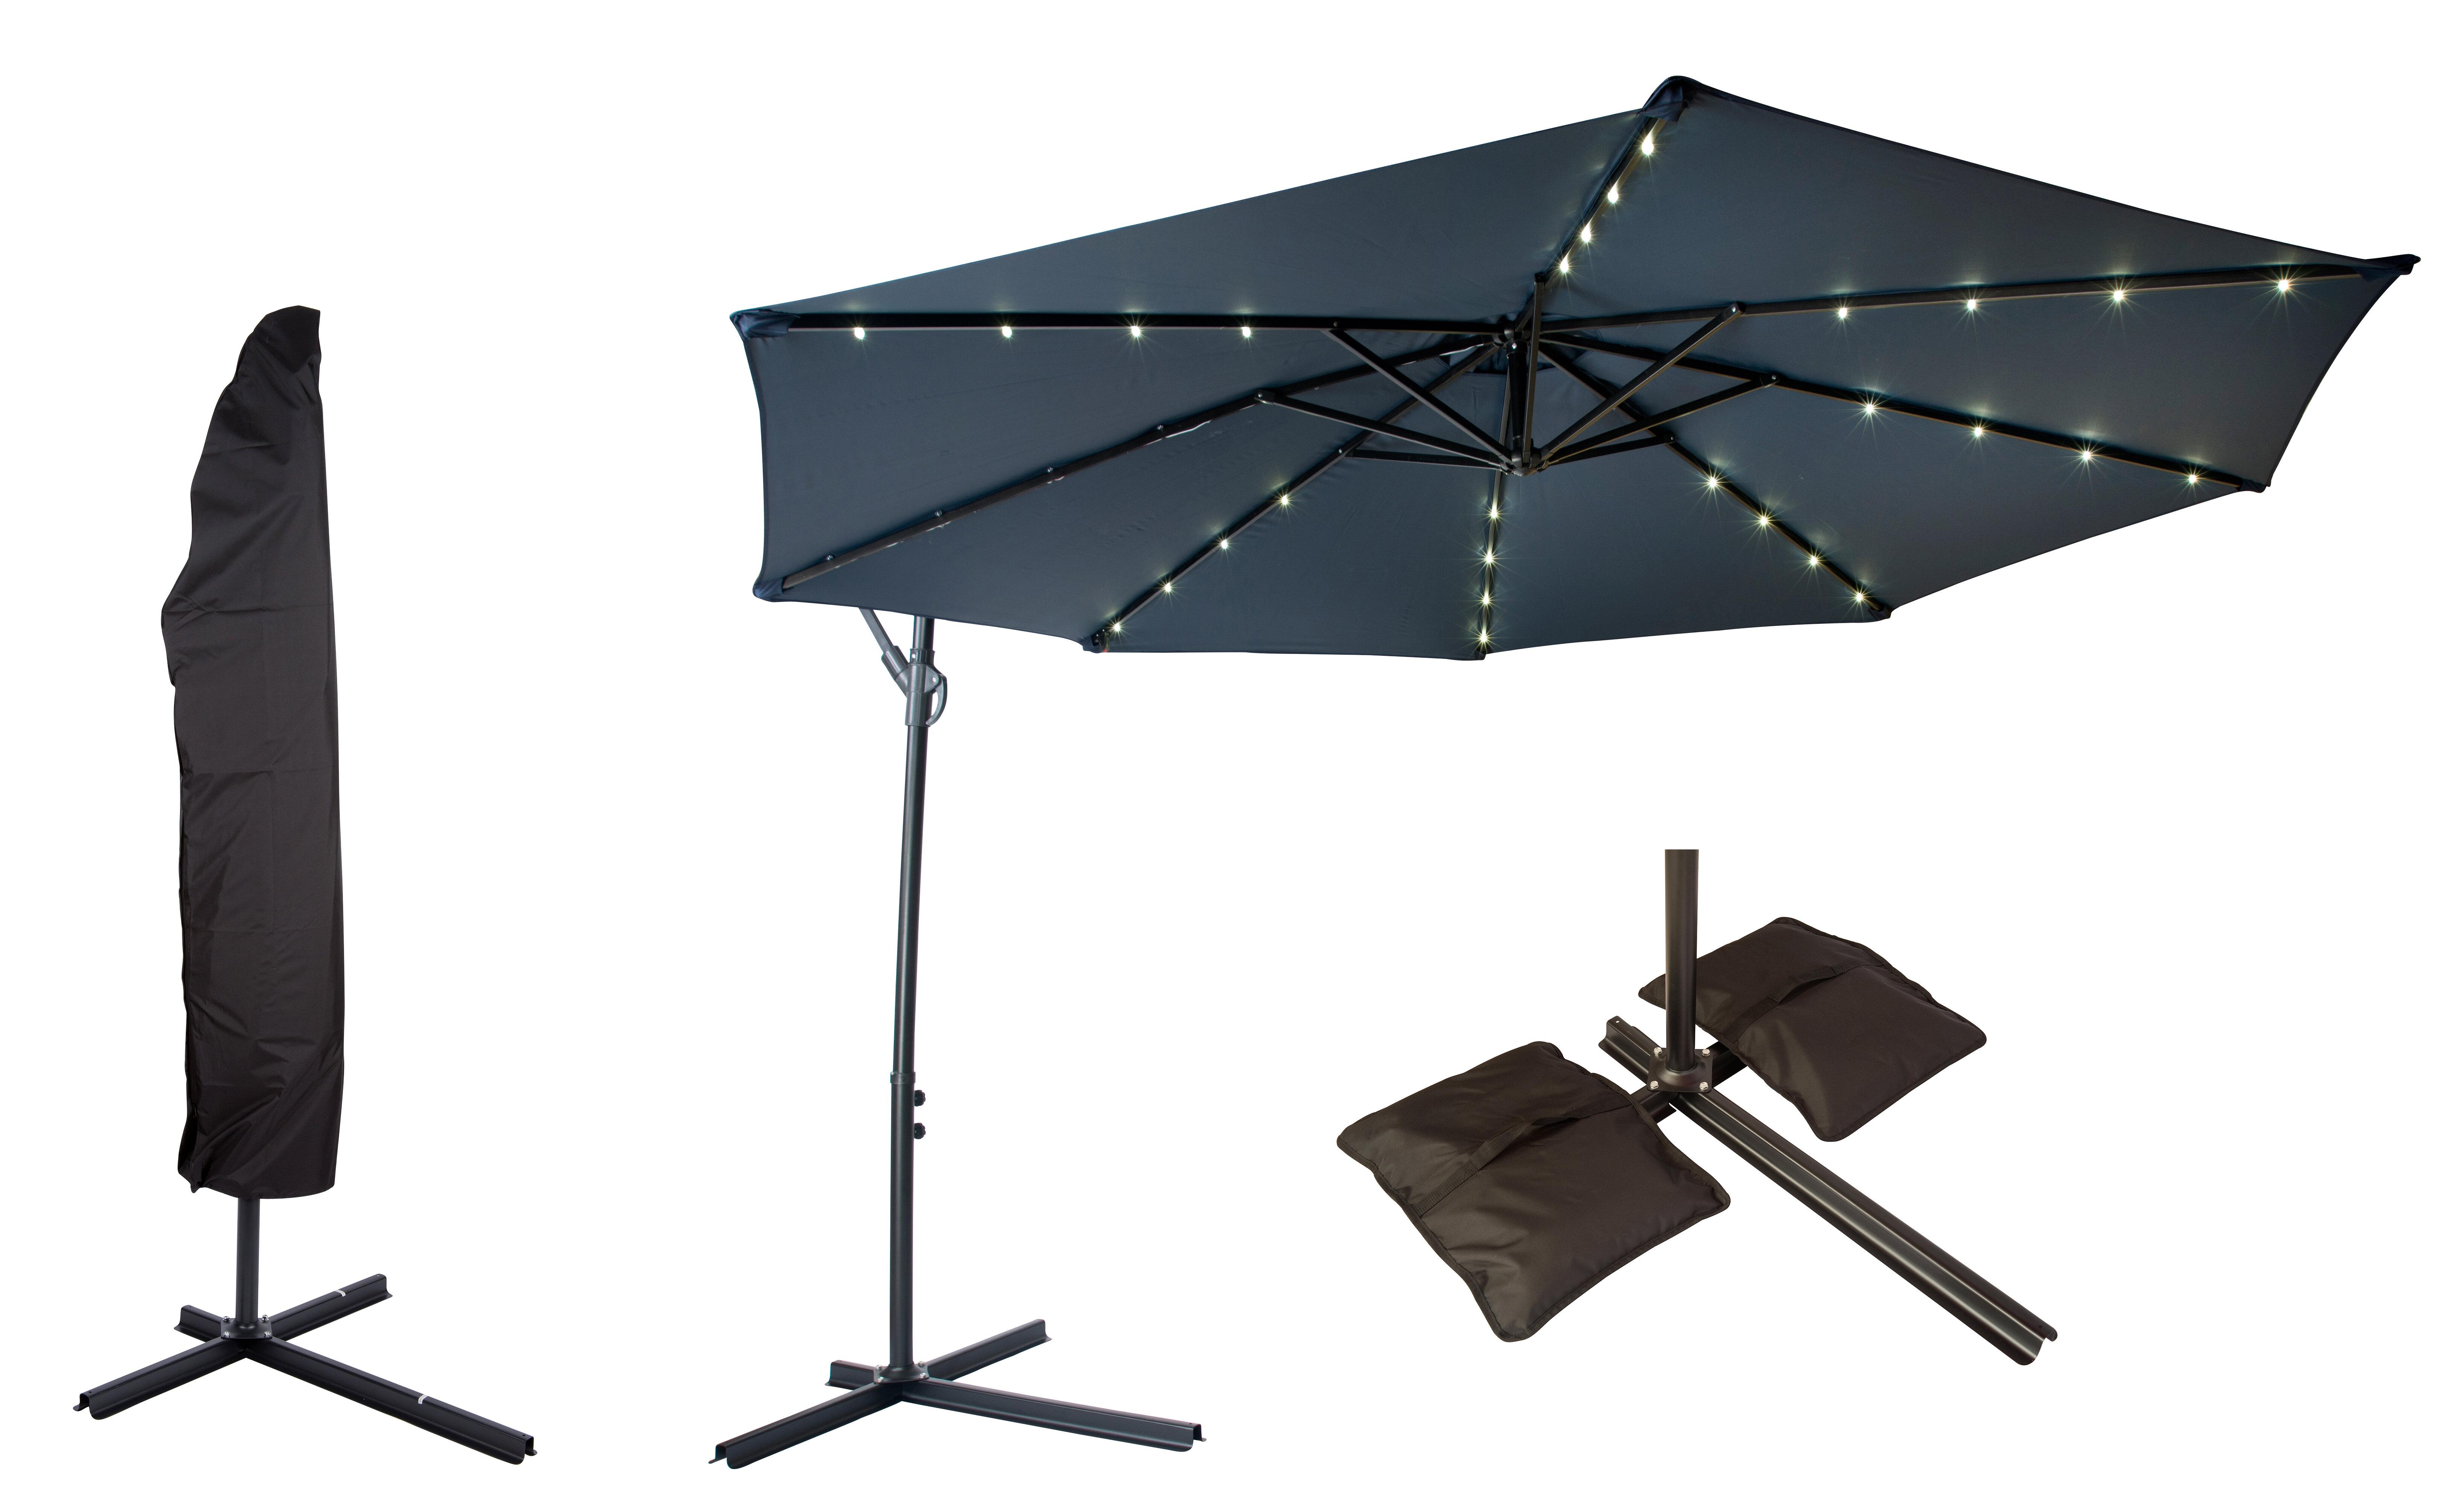 Trademark Innovations fset Patio 10 Cantilever Umbrella